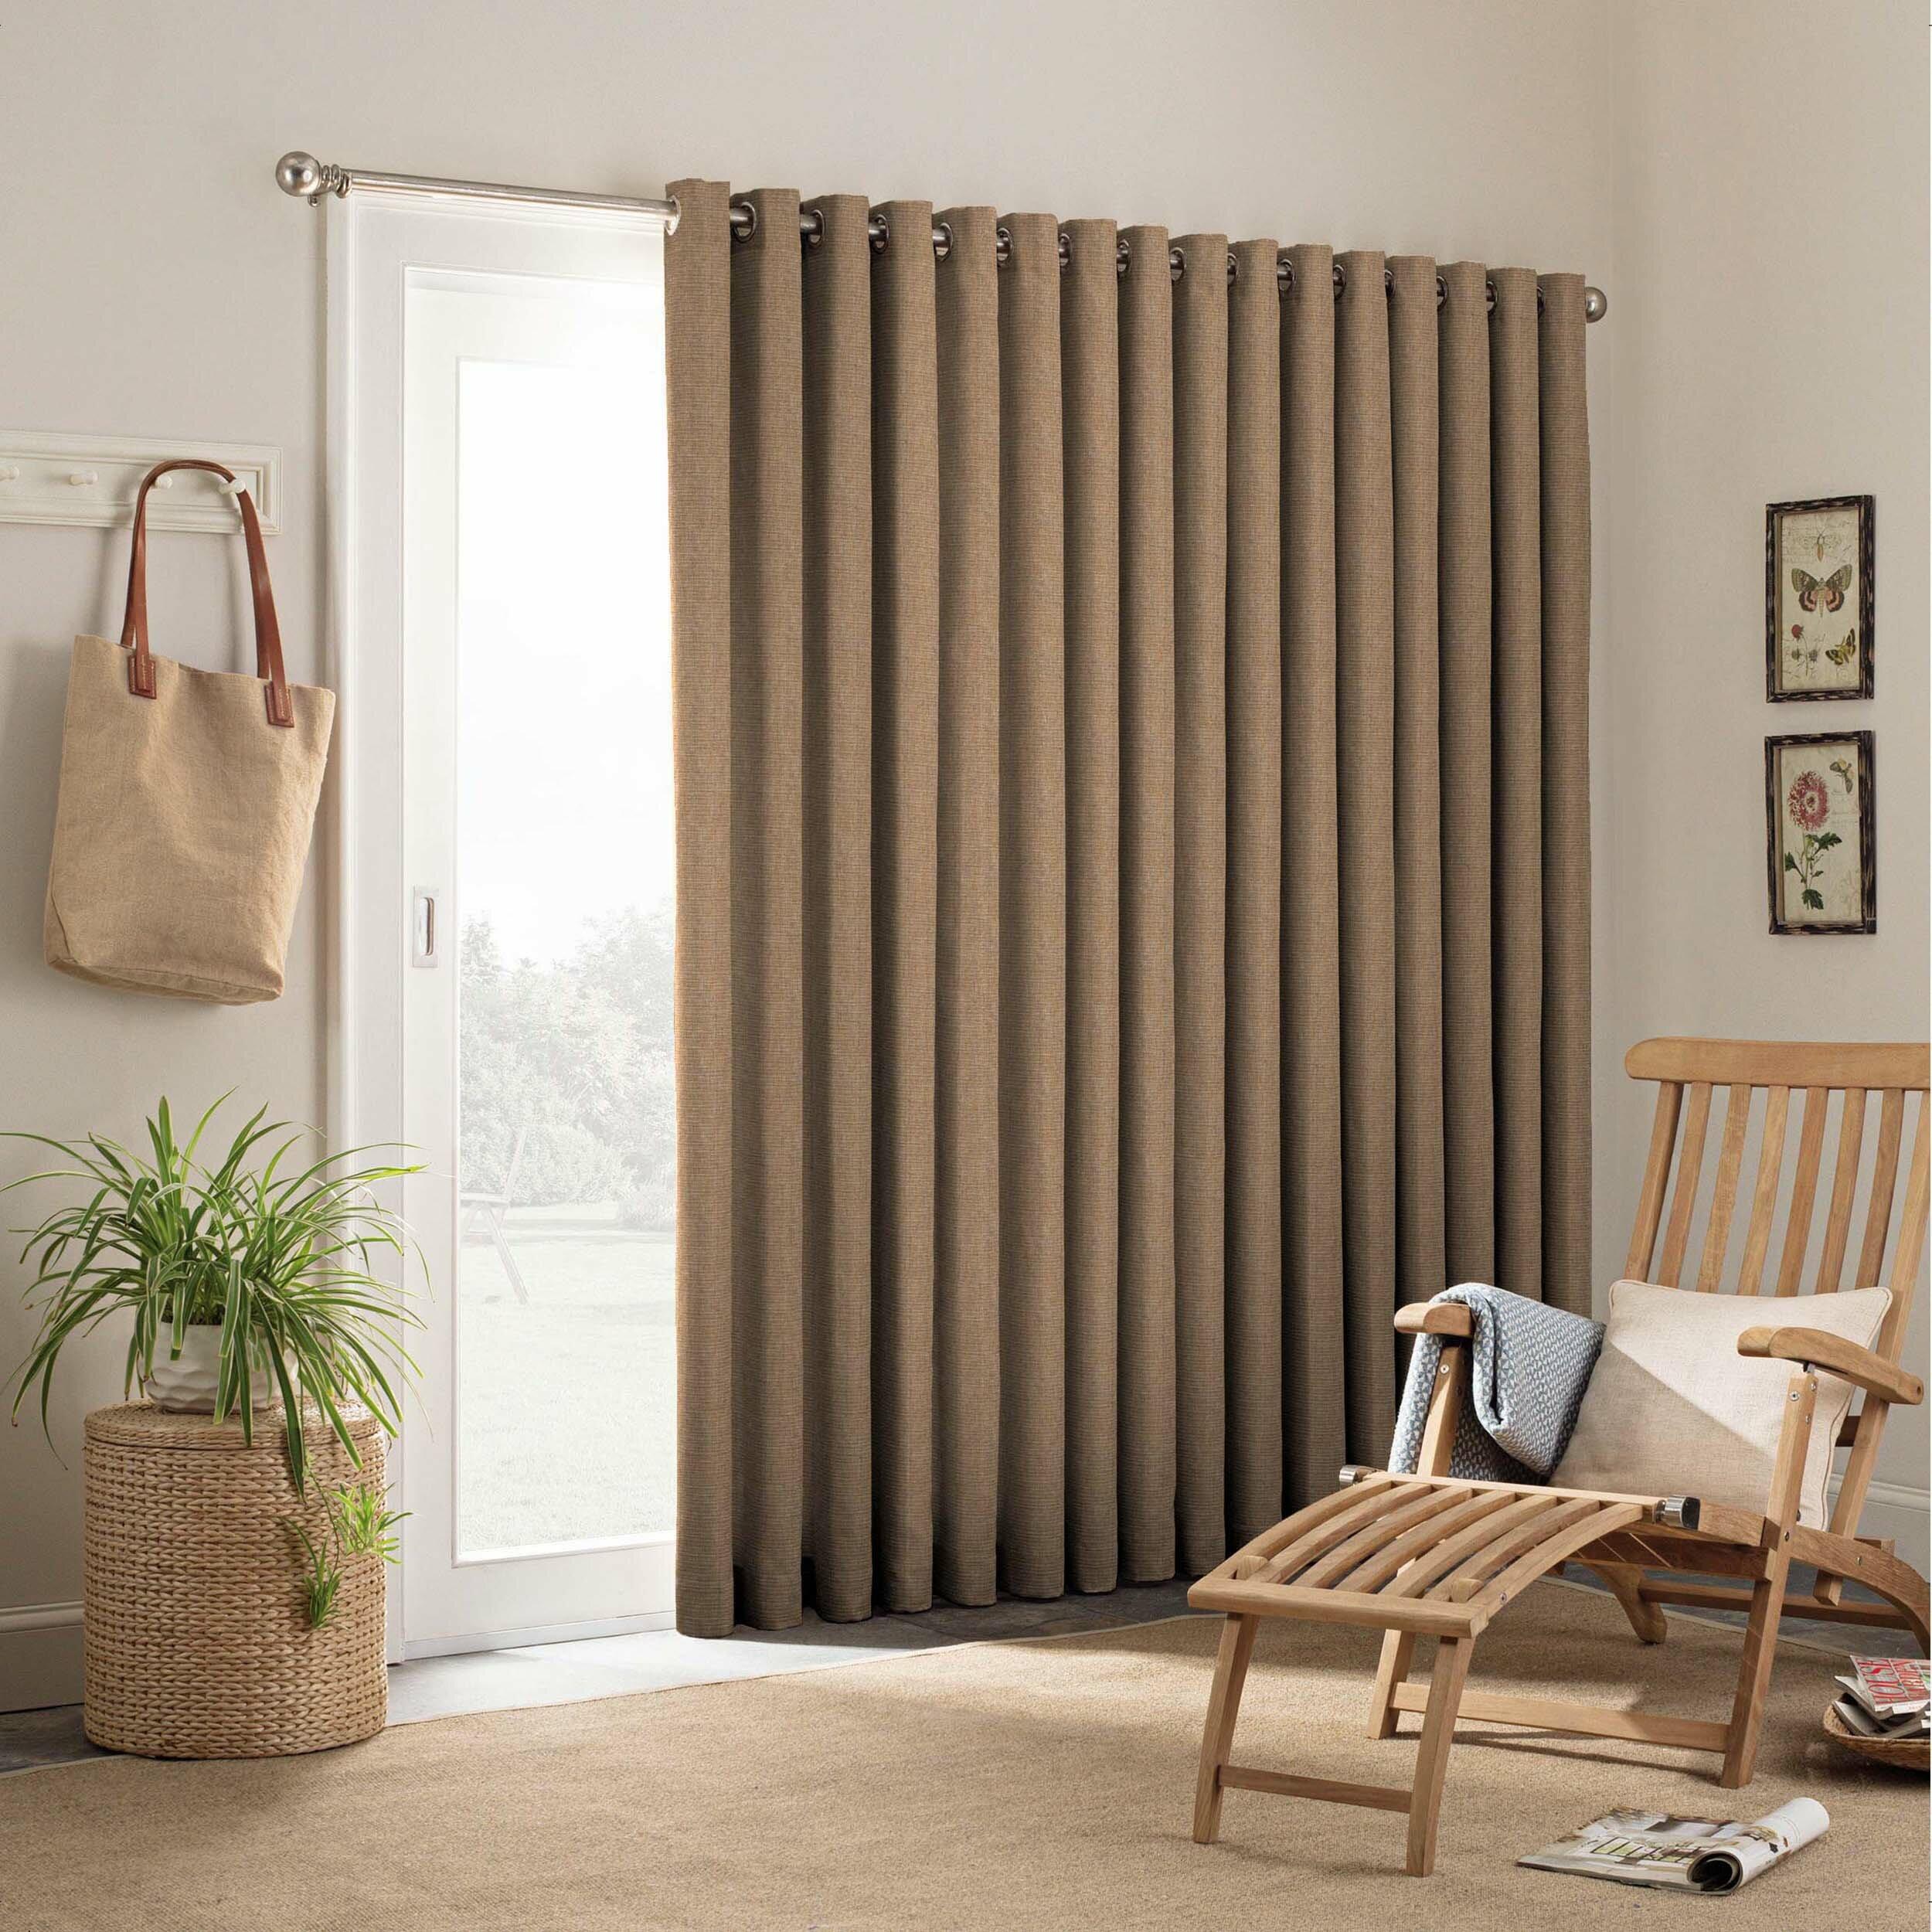 parasol key largo patio door indoor outdoor single curtain panel. Black Bedroom Furniture Sets. Home Design Ideas